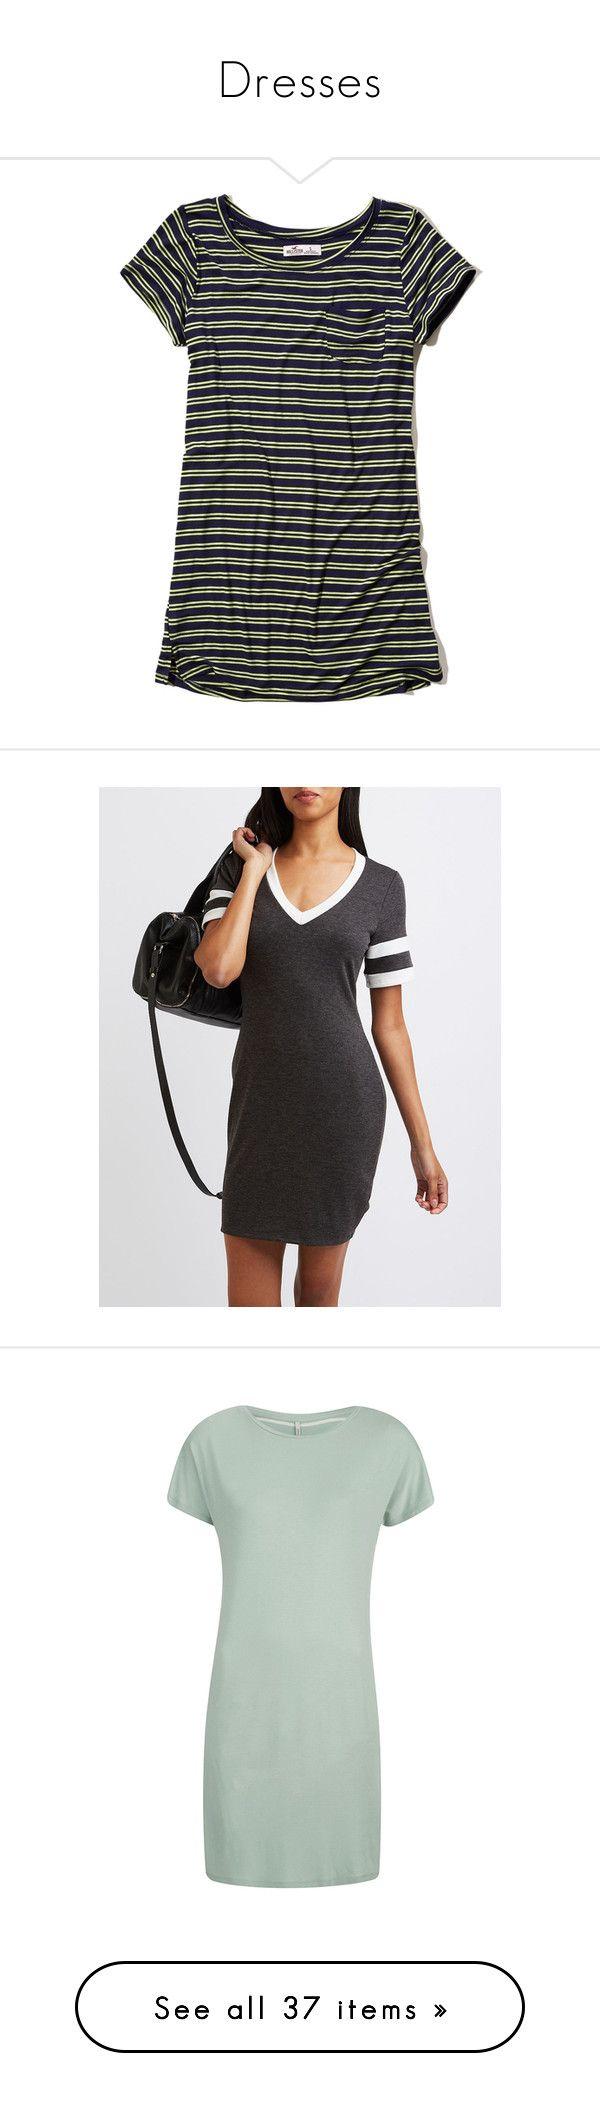 """Dresses"" by jgdelaossa ❤ liked on Polyvore featuring dresses, navy stripe, navy striped dress, navy stripe dress, knit dress, navy blue striped dress, blue striped dress, charcoal heath, t shirt dress and short-sleeve dresses"